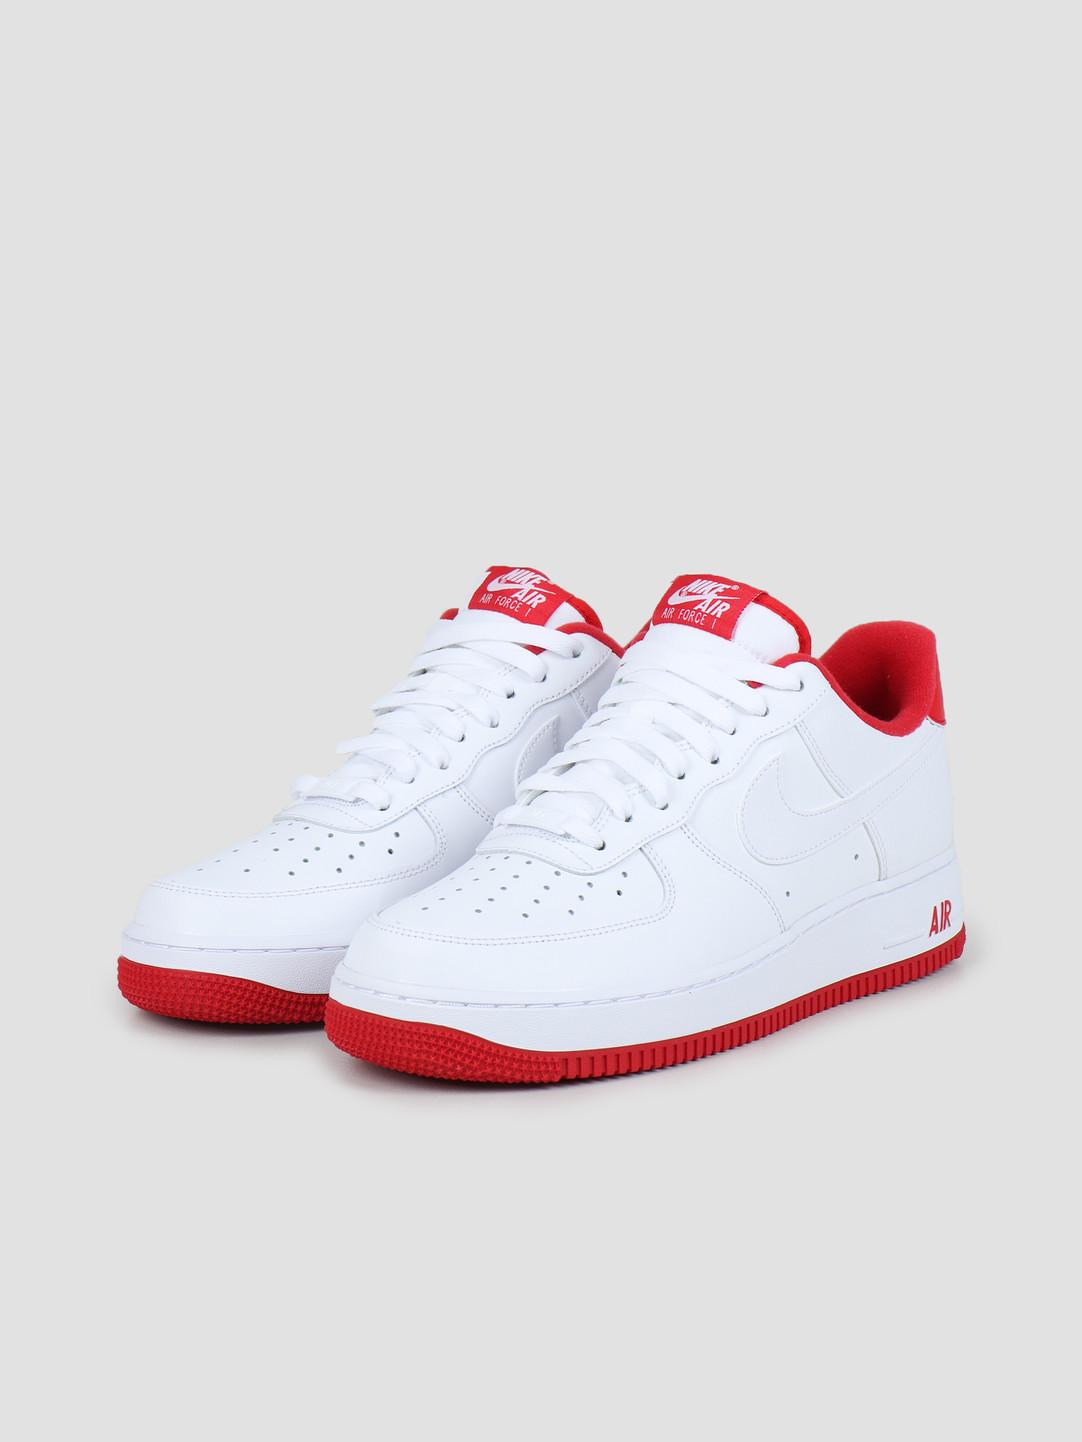 Nike Nike Air Force 1 '07 1 White University Red CD0884-101